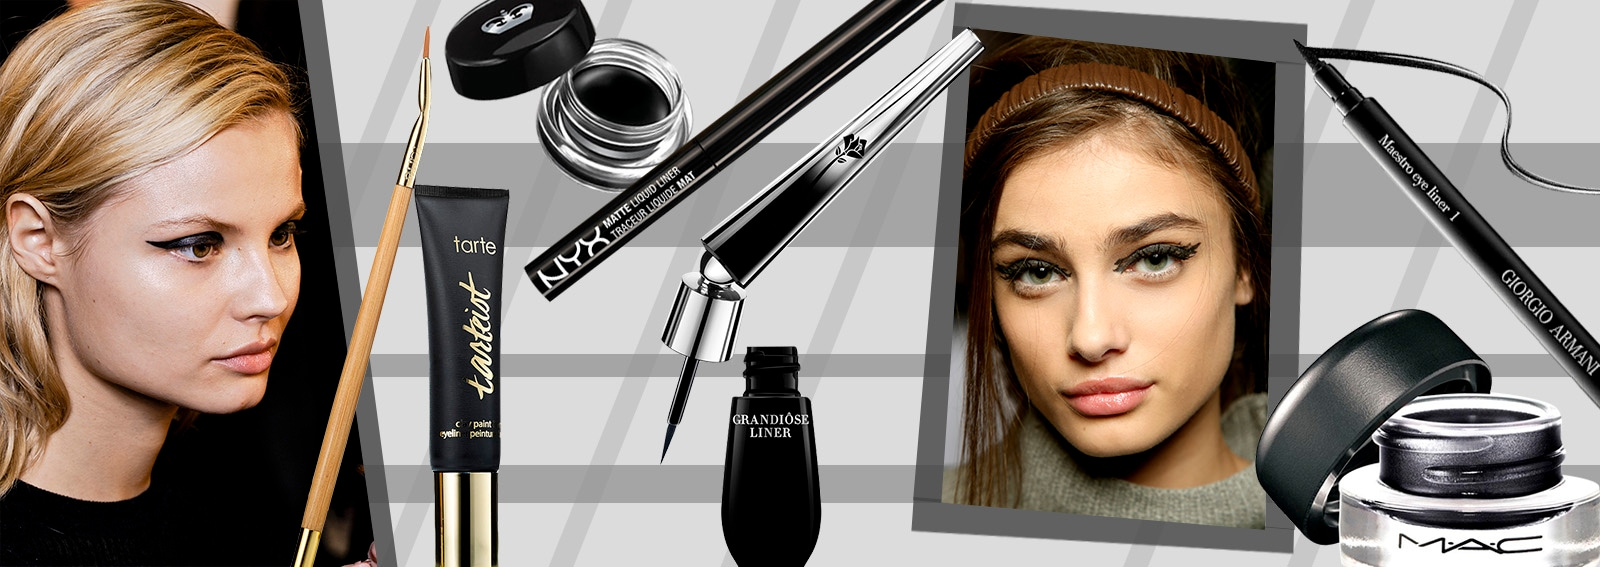 cover-migliori-eyeliner-neri-opachi-desktop